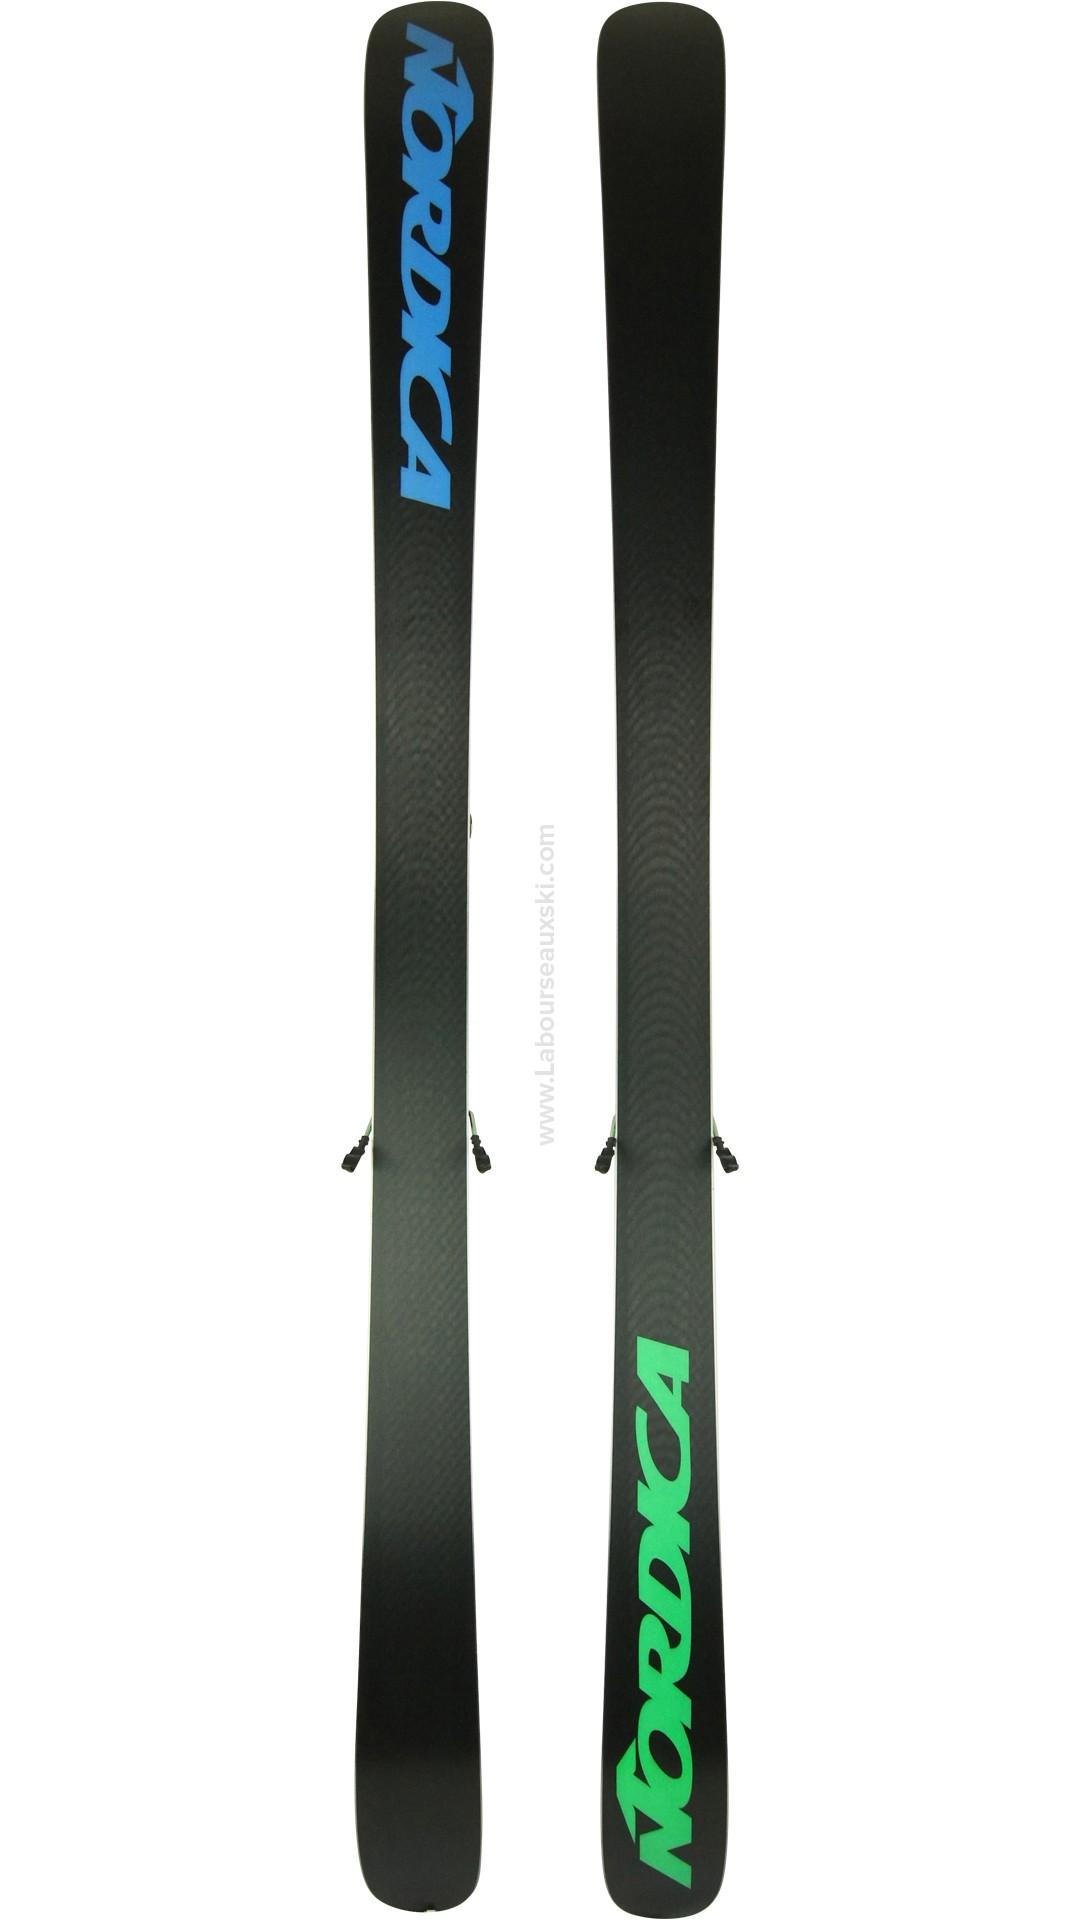 ski occasion nordica el paco skis d 39 occasion. Black Bedroom Furniture Sets. Home Design Ideas